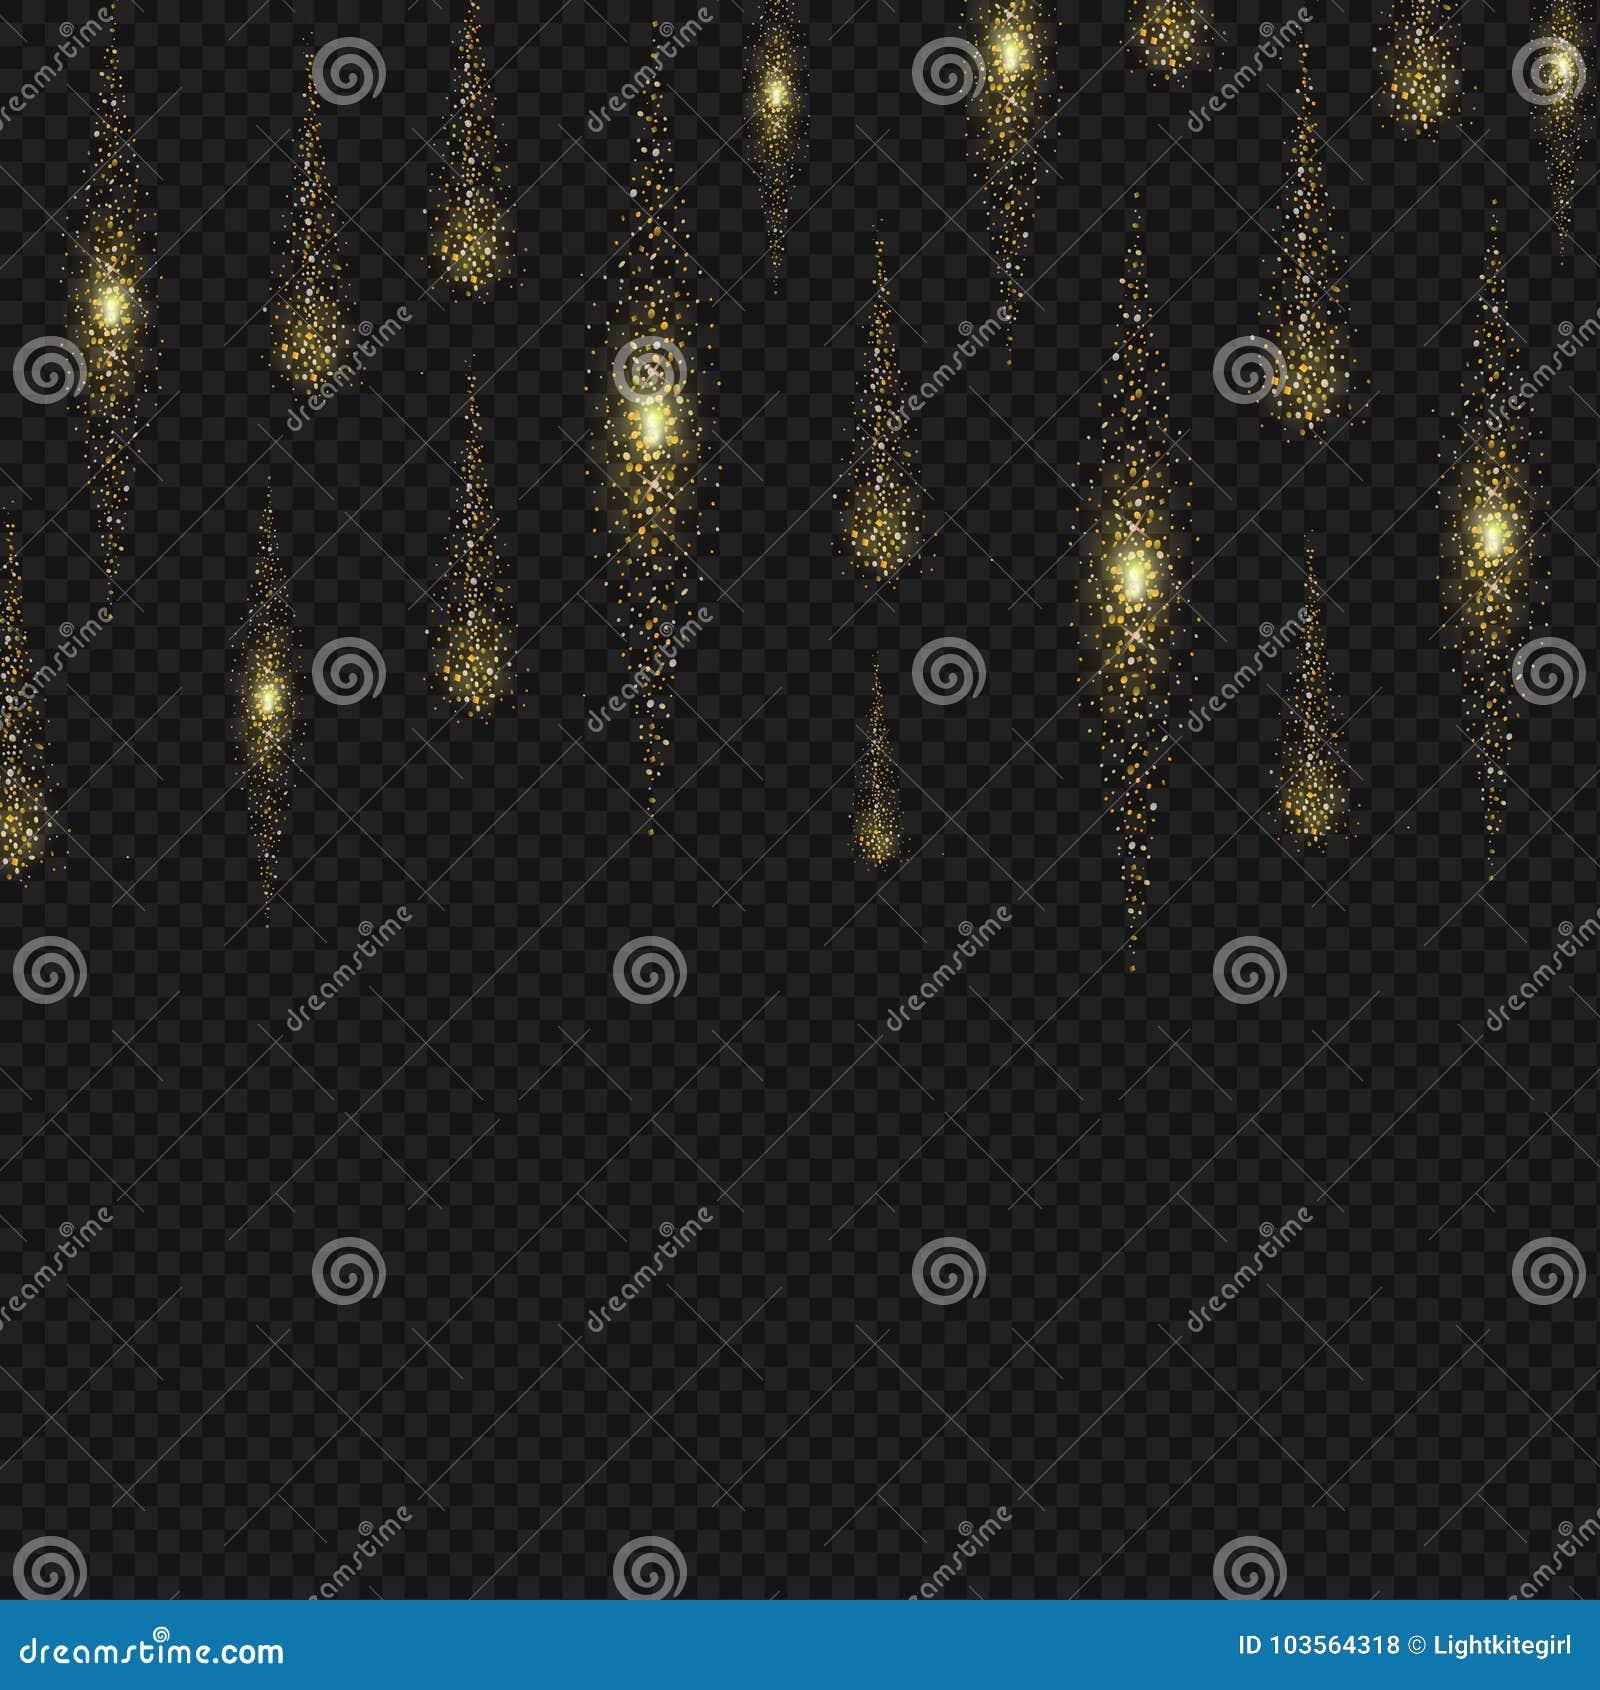 Fondo del stardust del brillo del oro Líneas chispeantes Vector de la lluvia del reflejo